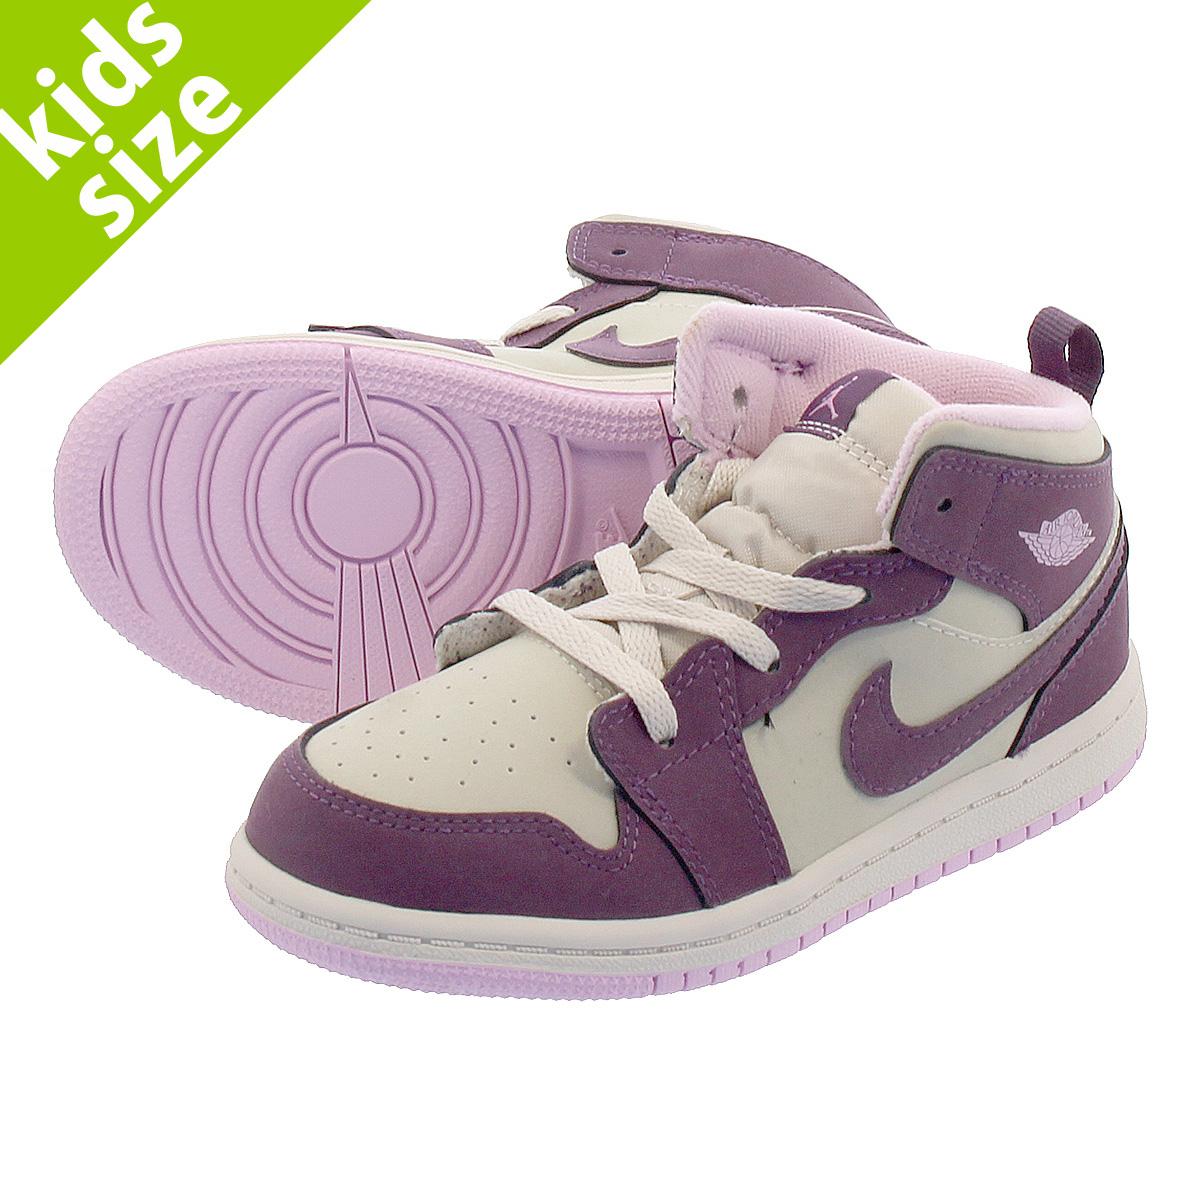 new arrival 4ab40 64d4d NIKE AIR JORDAN 1 MID GT Nike Air Jordan 1 mid GT PURPLE DESERT SAND ARCTIC  PINK 644,507-500